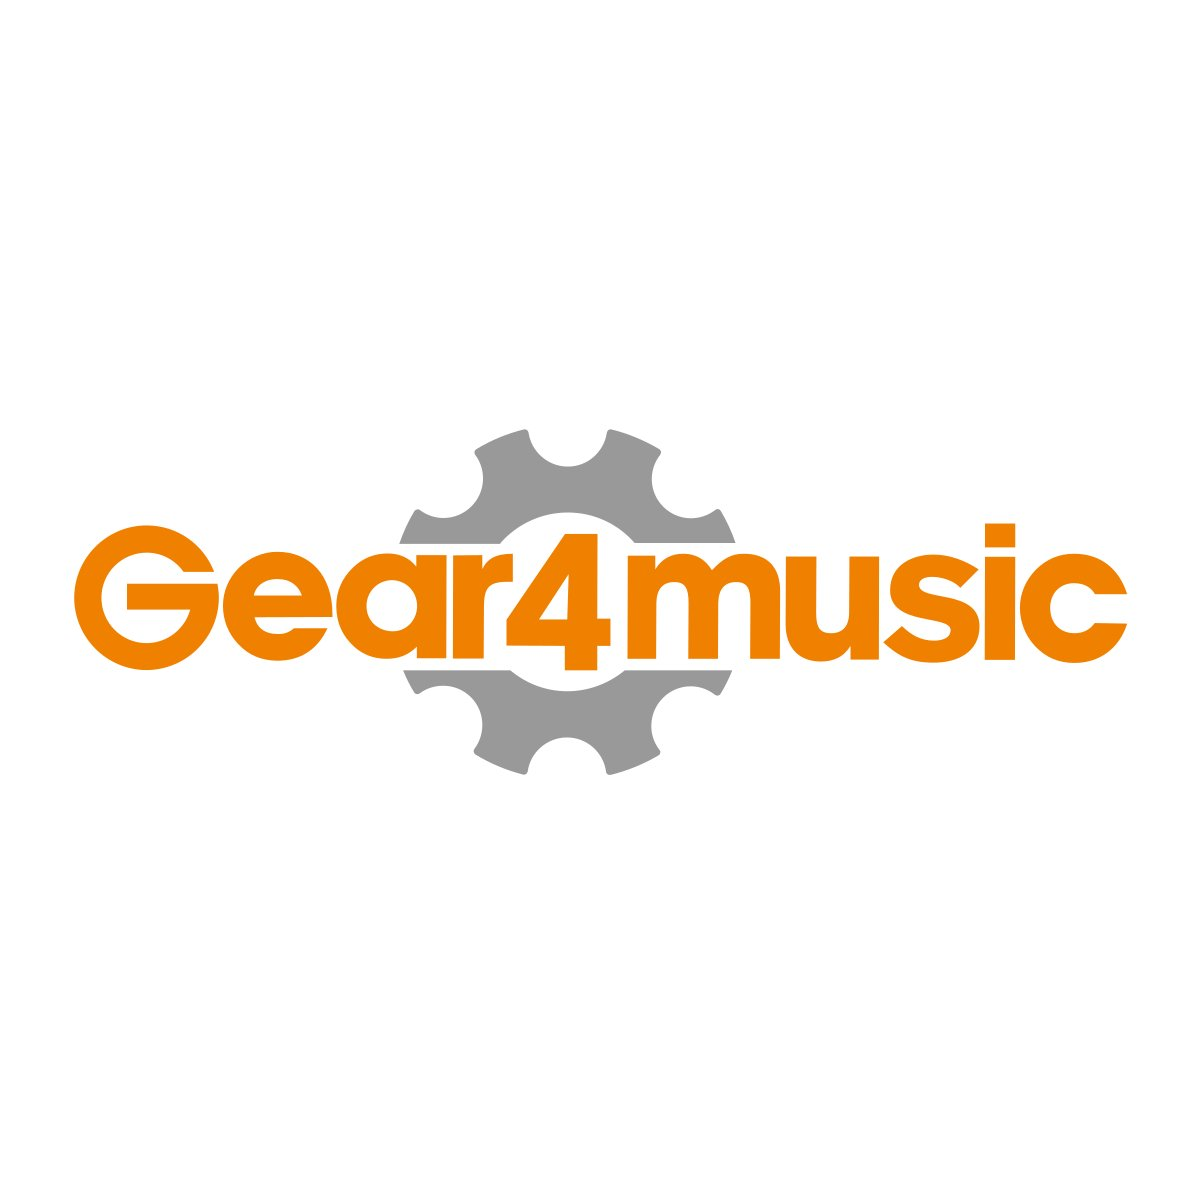 MK-6000 Keyboard mit USB-MIDI von Gear4music – Komplettpaket